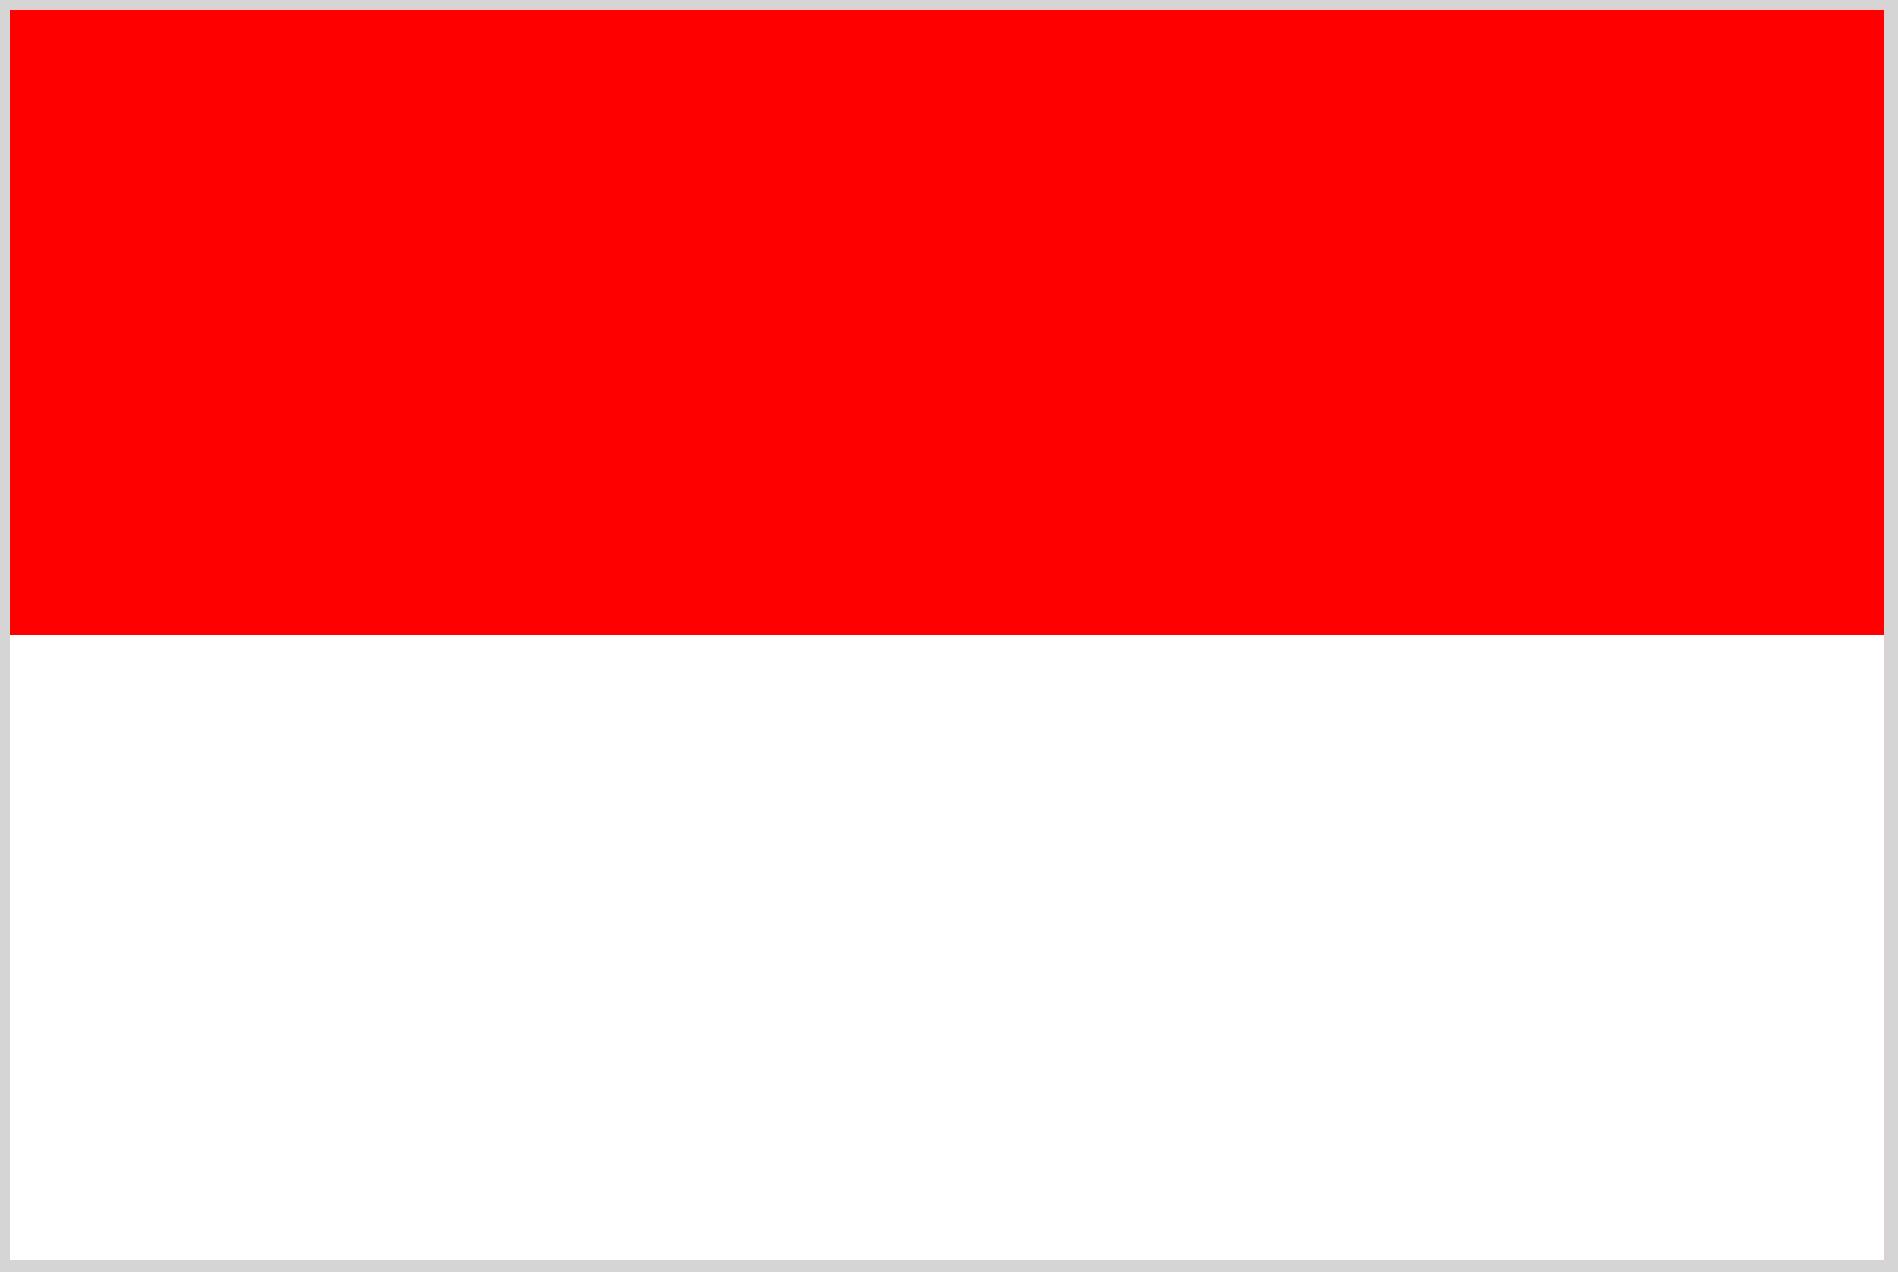 By drawing: User:SKopp - statute: Undang-Undang Republik Indonesia Nomor 24 Tahun 2009 (WikisourcePDF), Public Domain,  https://commons.wikimedia.org/w/index.php?curid=343610